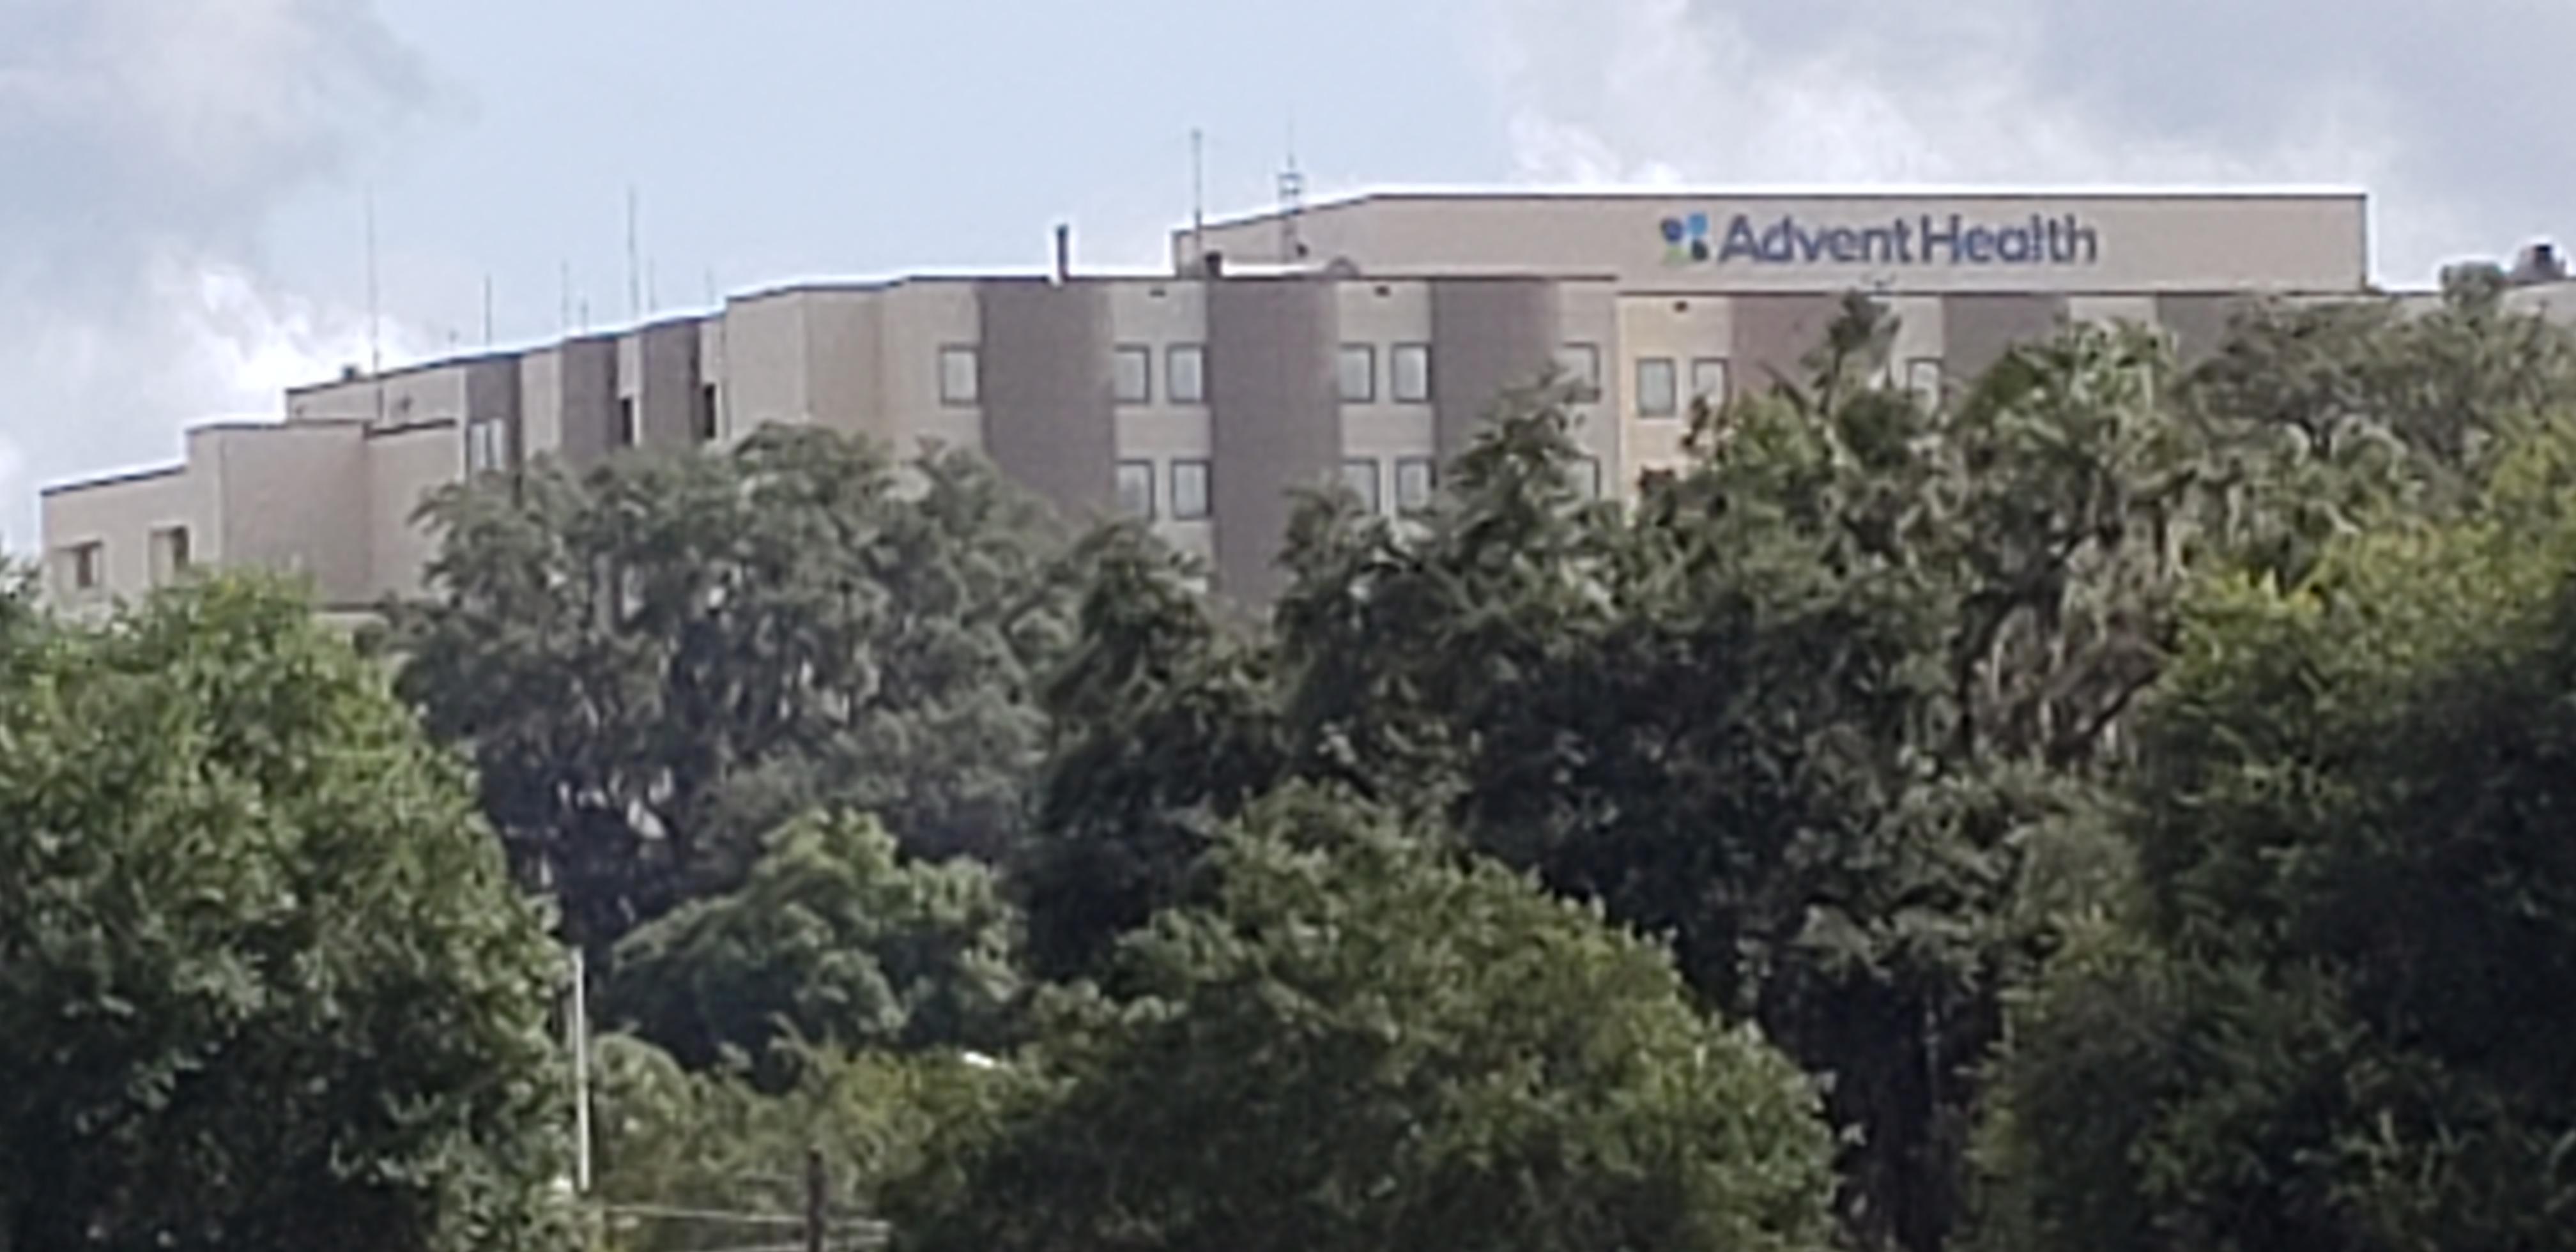 Advent Health - Ocala, FL